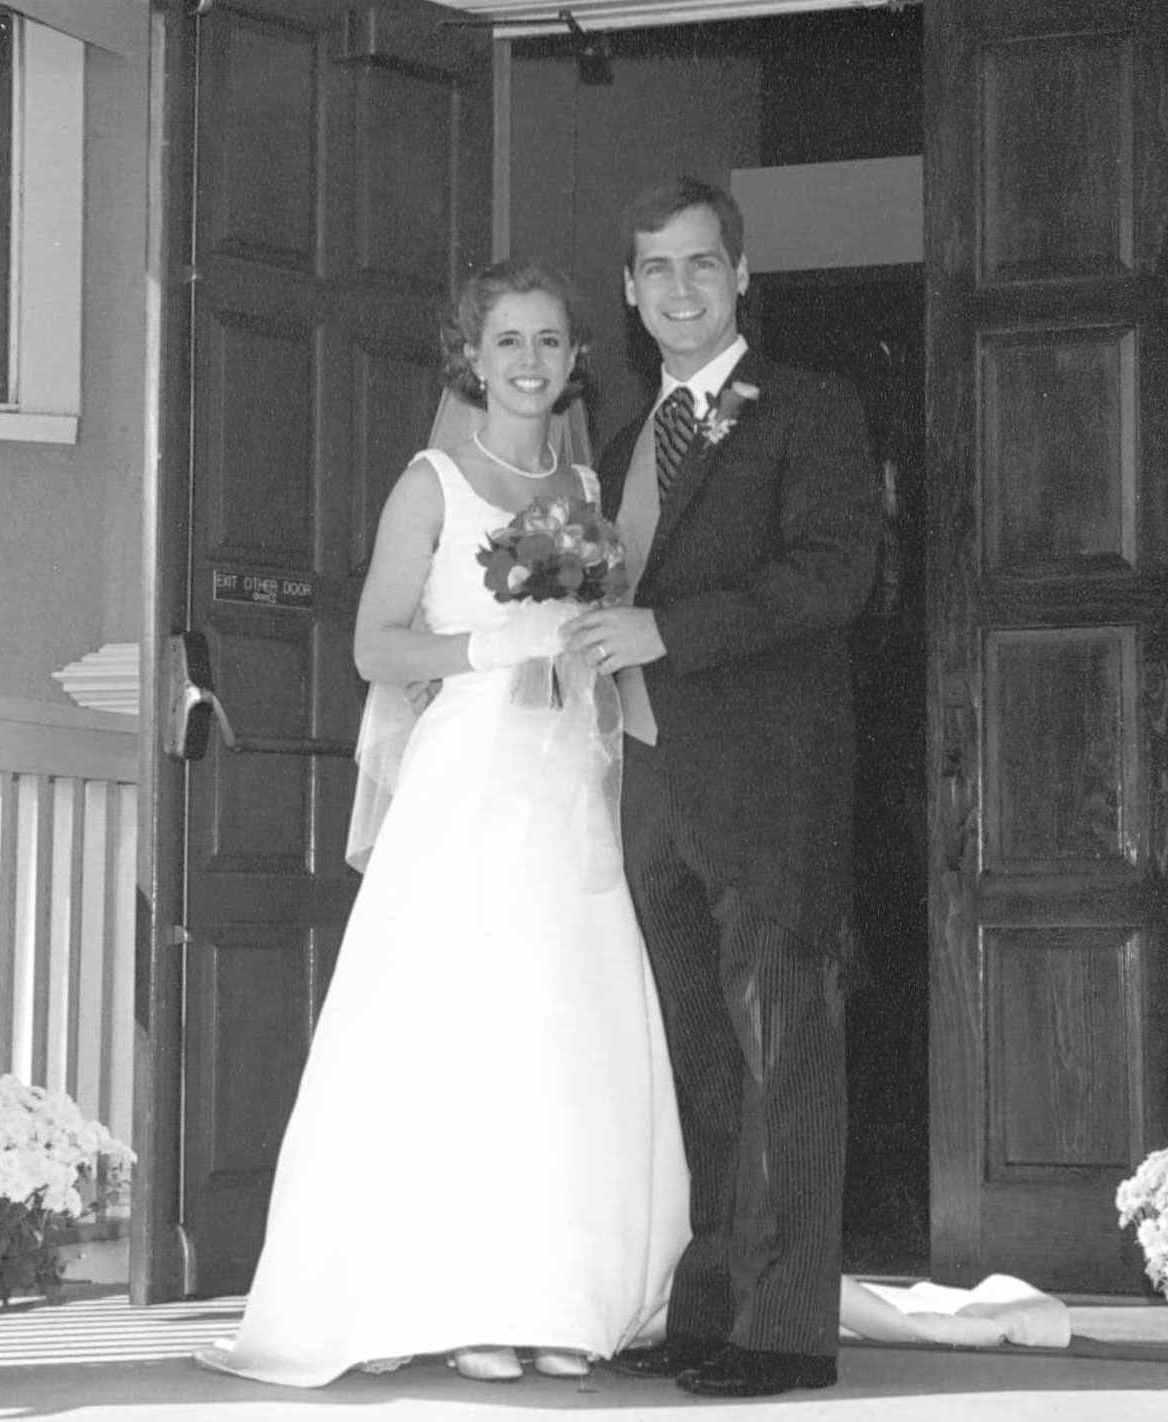 Young Ina Garten Wedding Photo